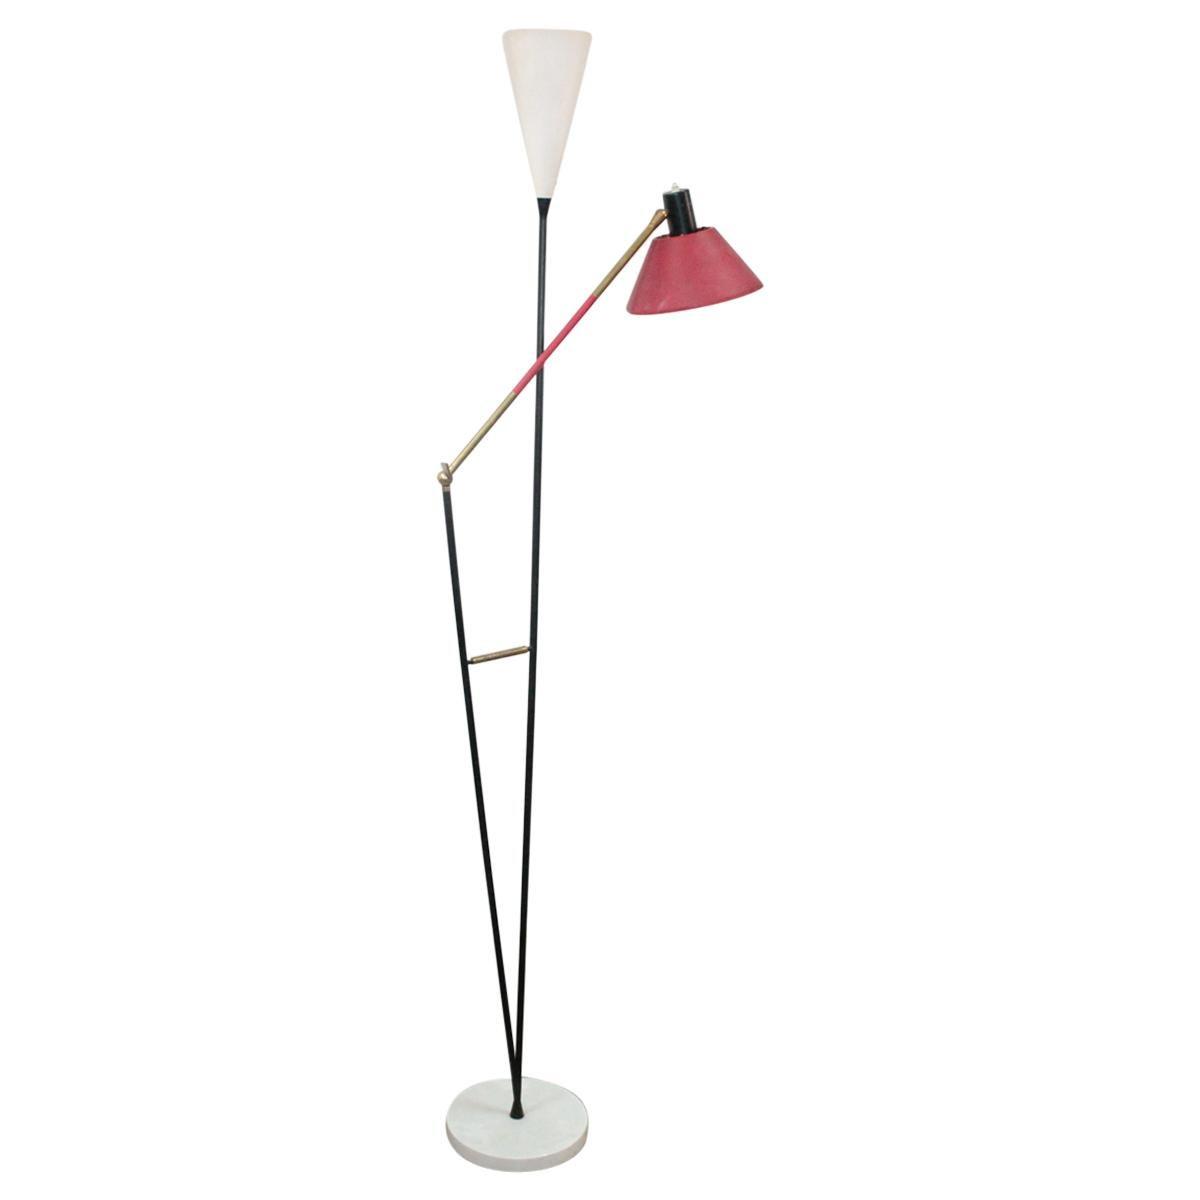 Stilux Milano Floor Lamp Brass, 1950s, Italy